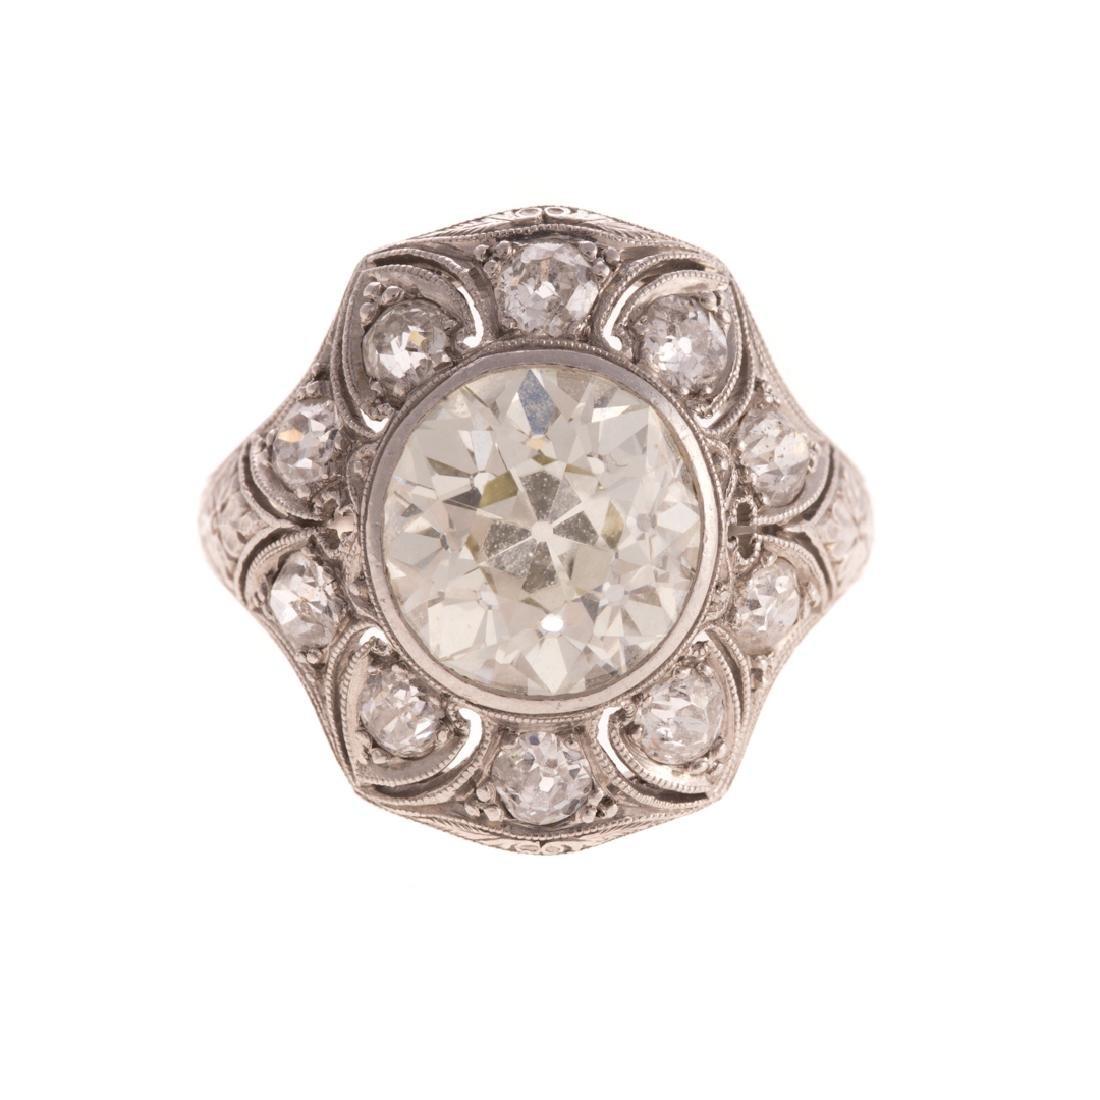 A Lady's 4.51 Diamond Art Deco Ring in Platinum